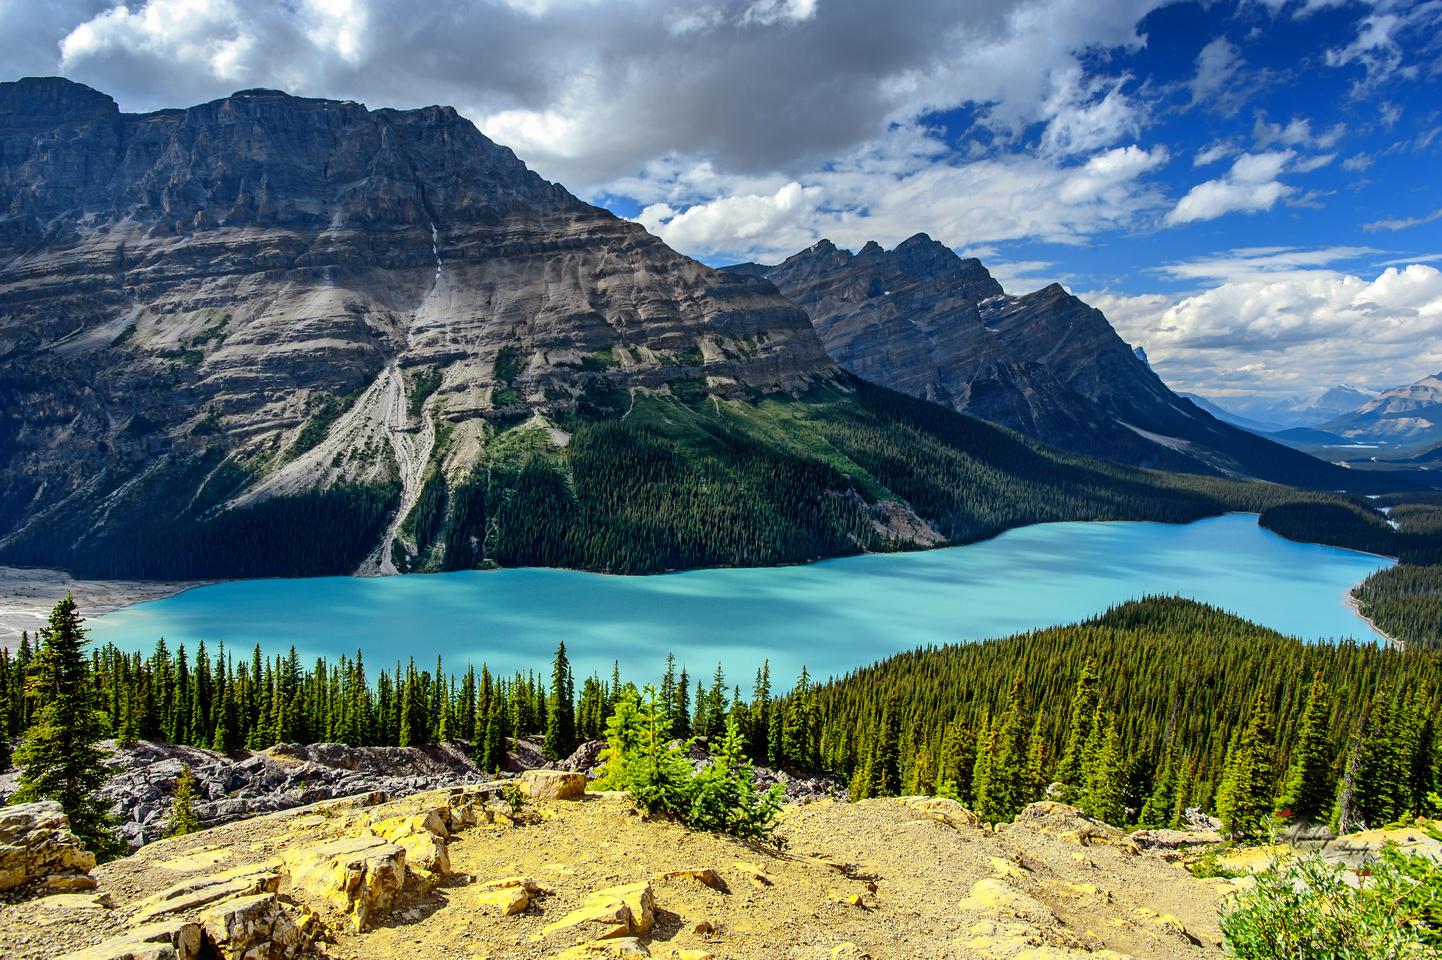 nationalpark alberta kanada - photo #29